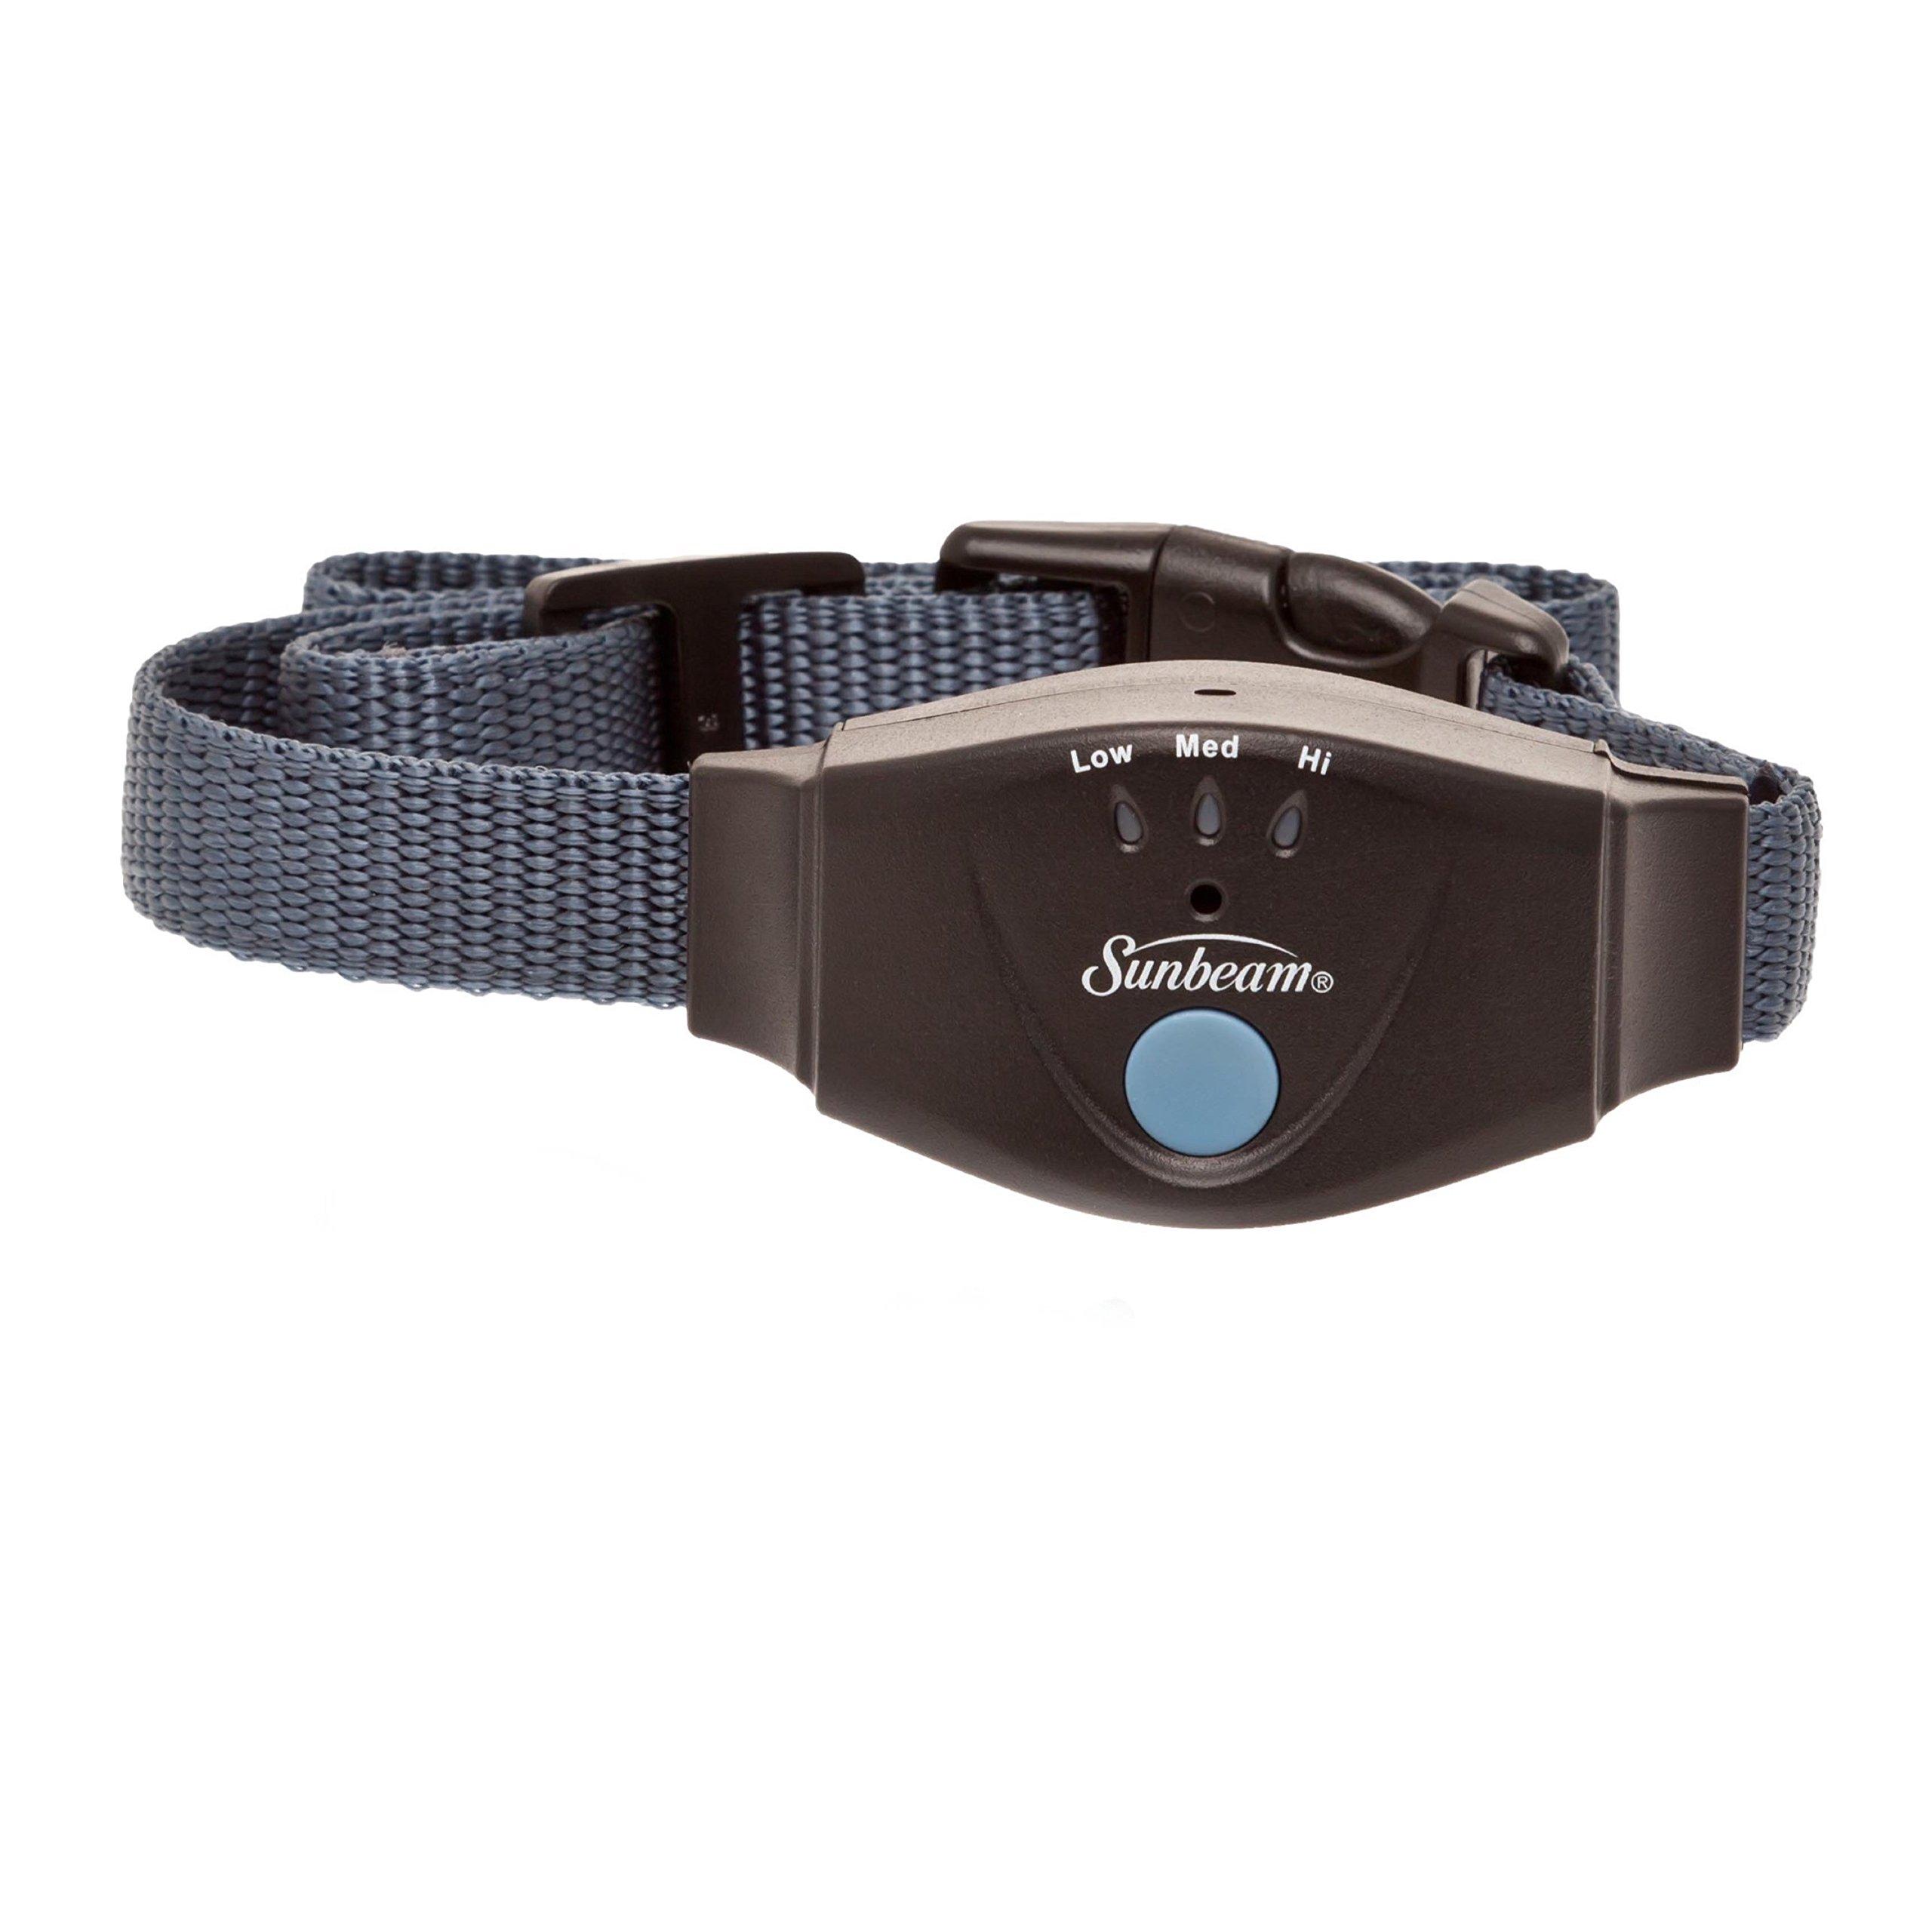 Sunbeam Advanced Static Bark Control Dog Collar